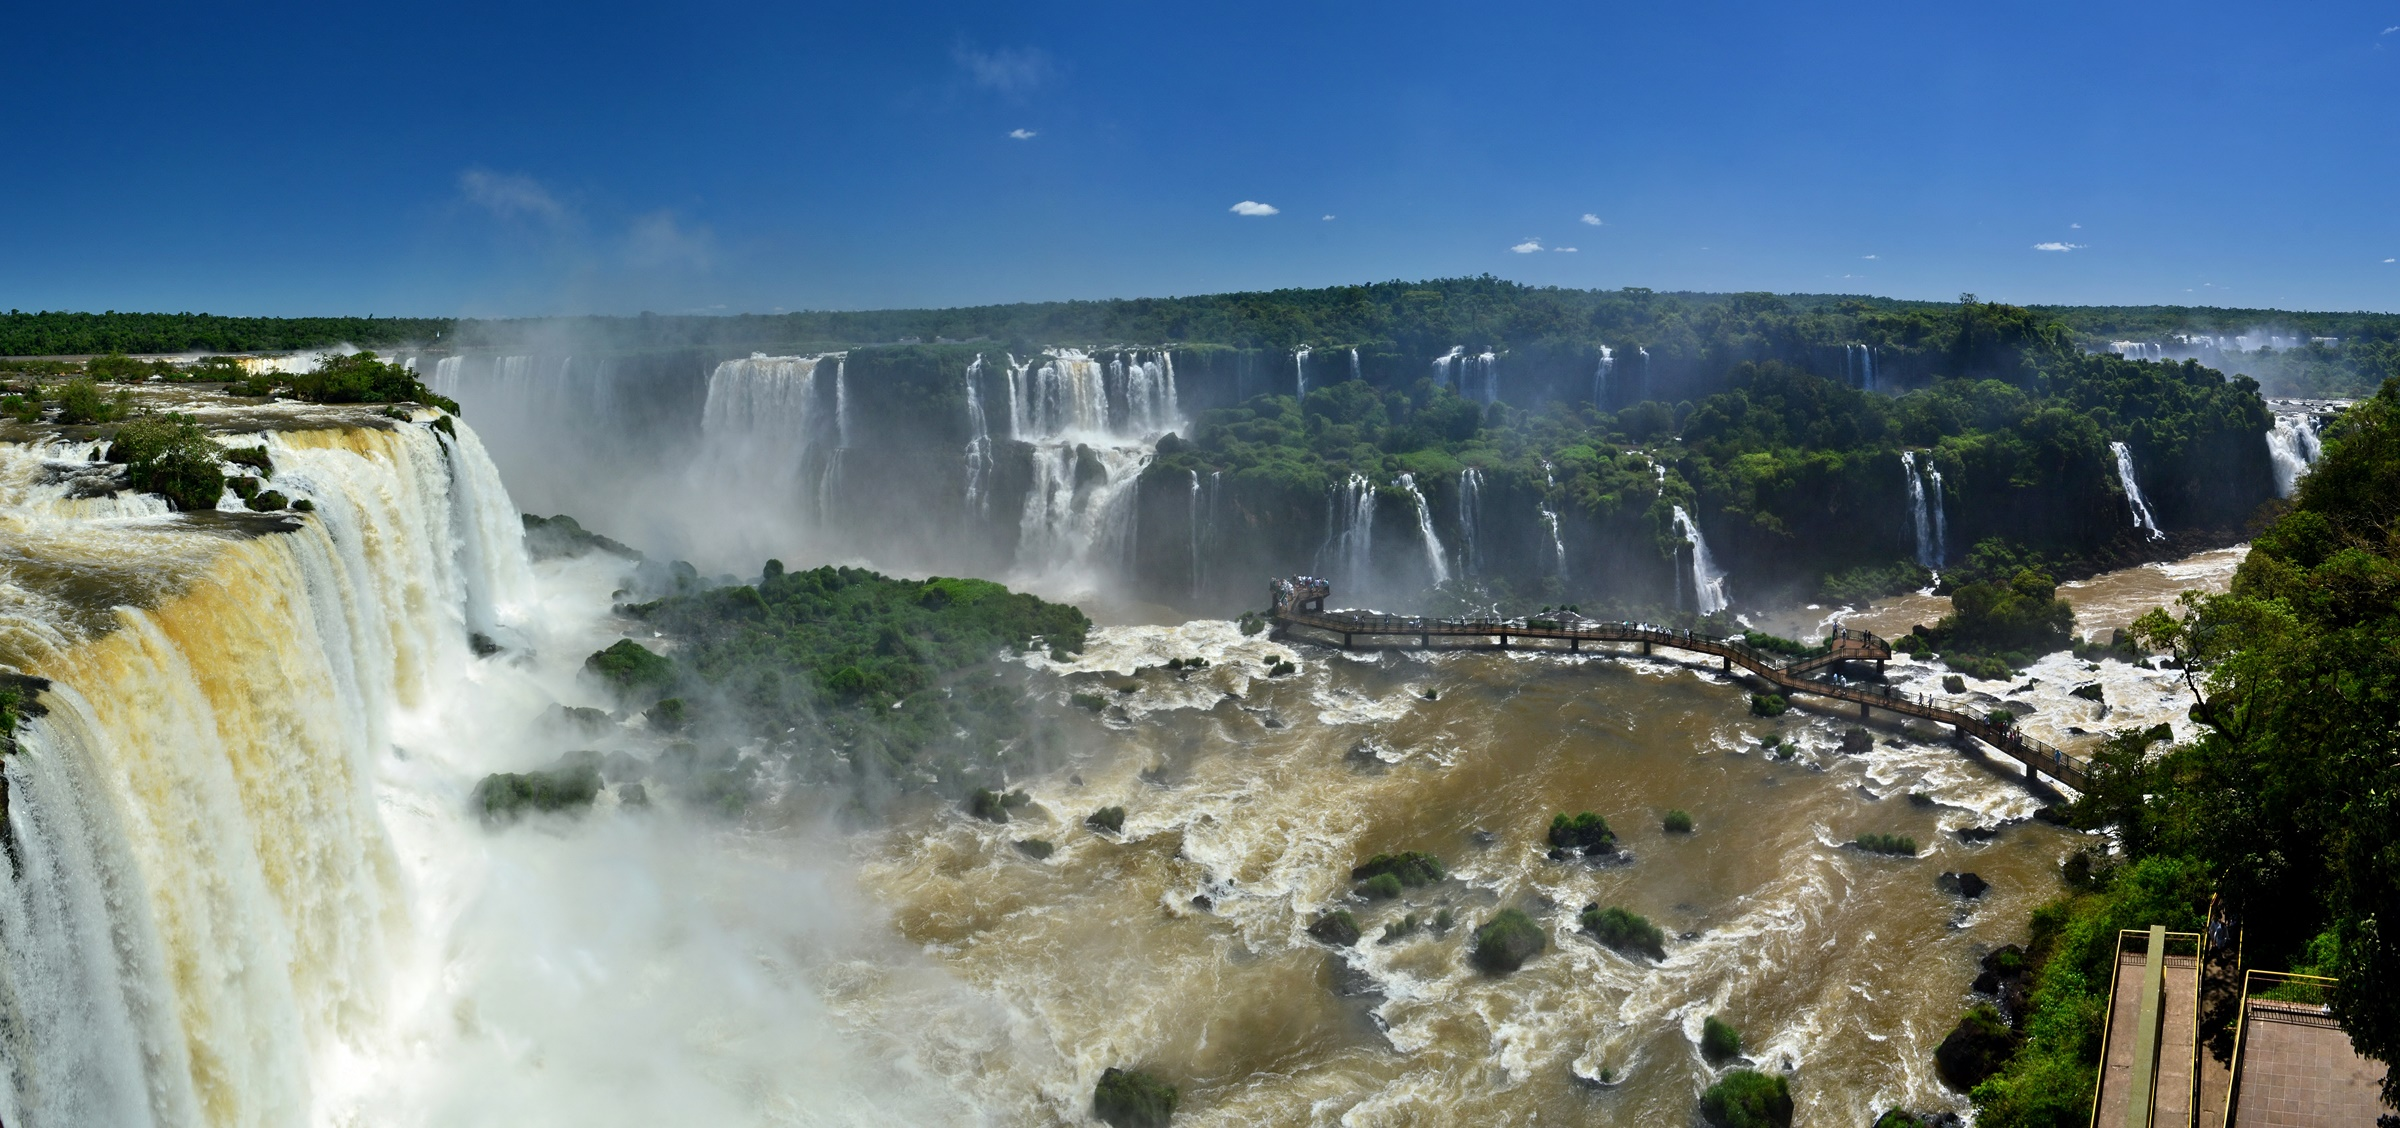 Visiter les Chutes Iguazù